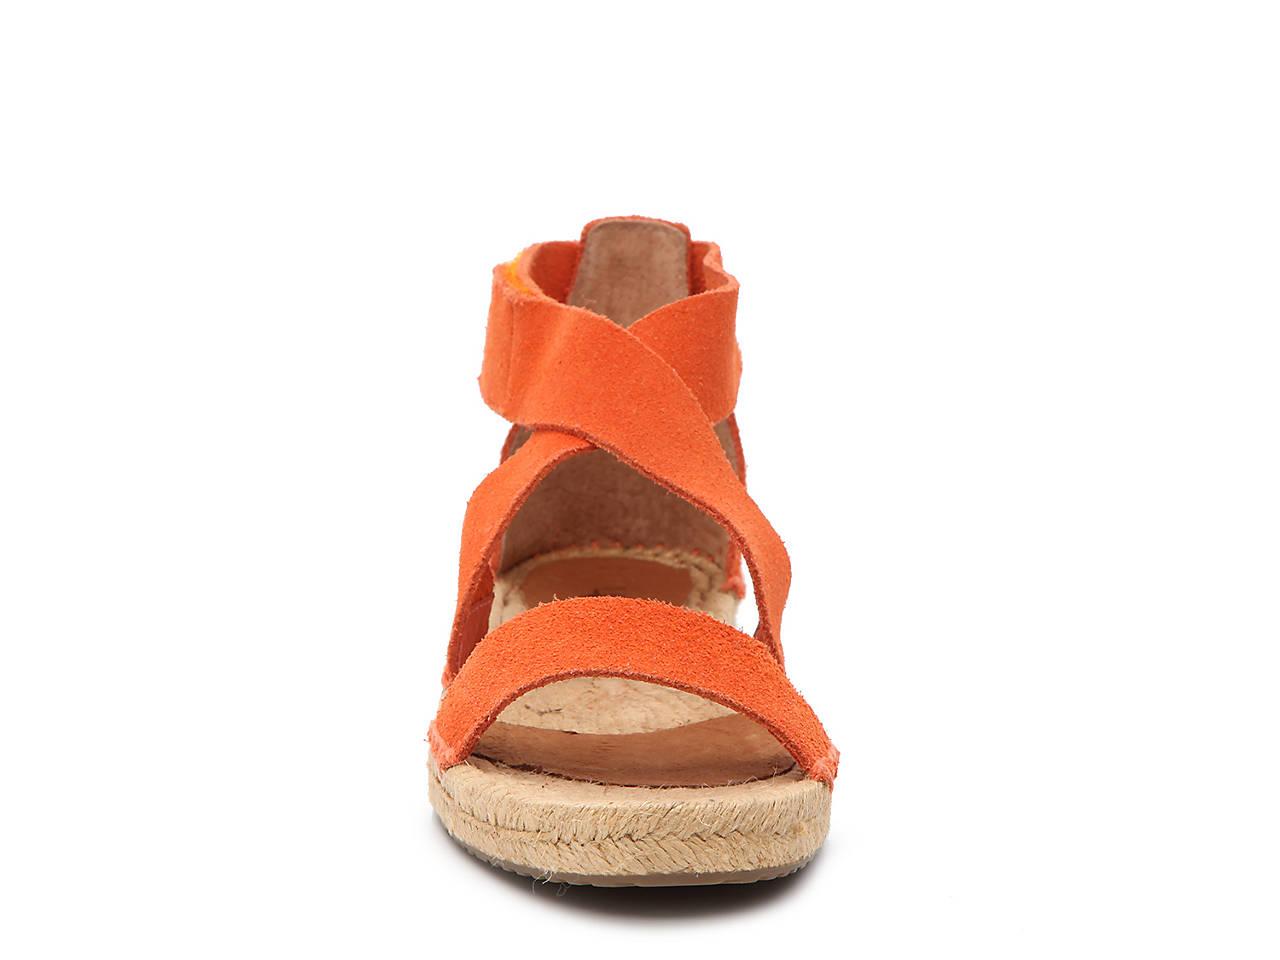 5d276ebbb91 UGG Mila Flat Sandal Women s Shoes